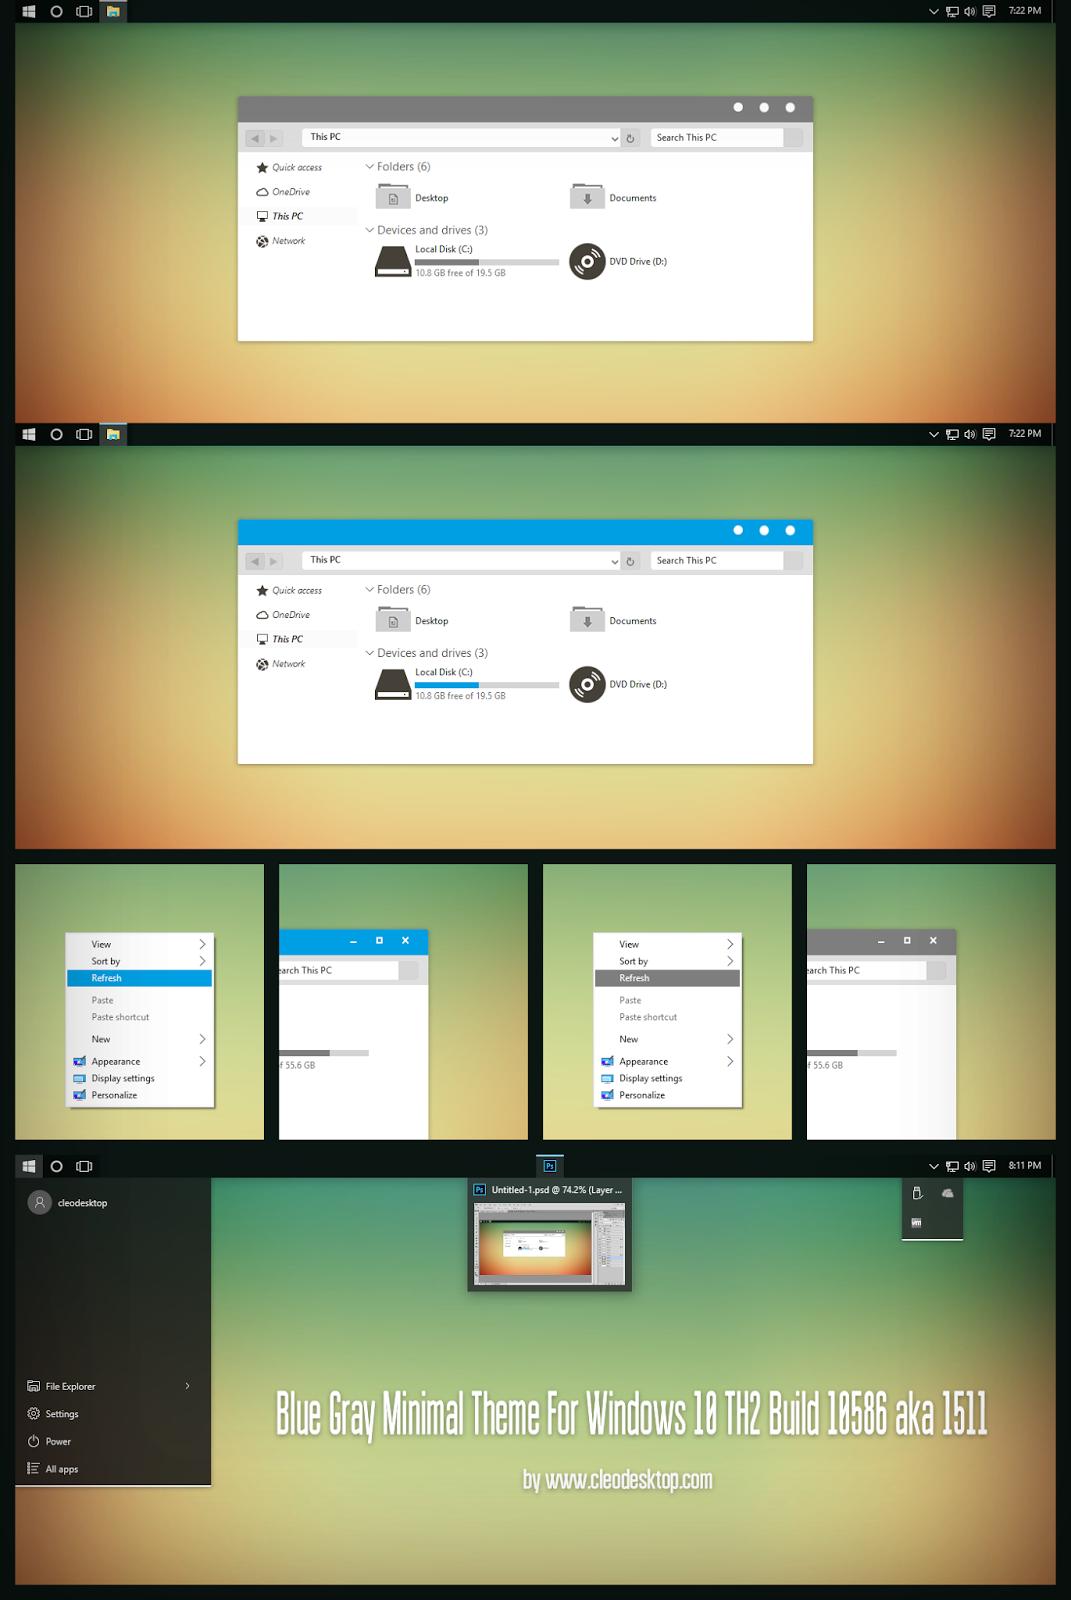 Blue Gray Minimal Theme For Windows10 TH2 Build 10586 aka 1511